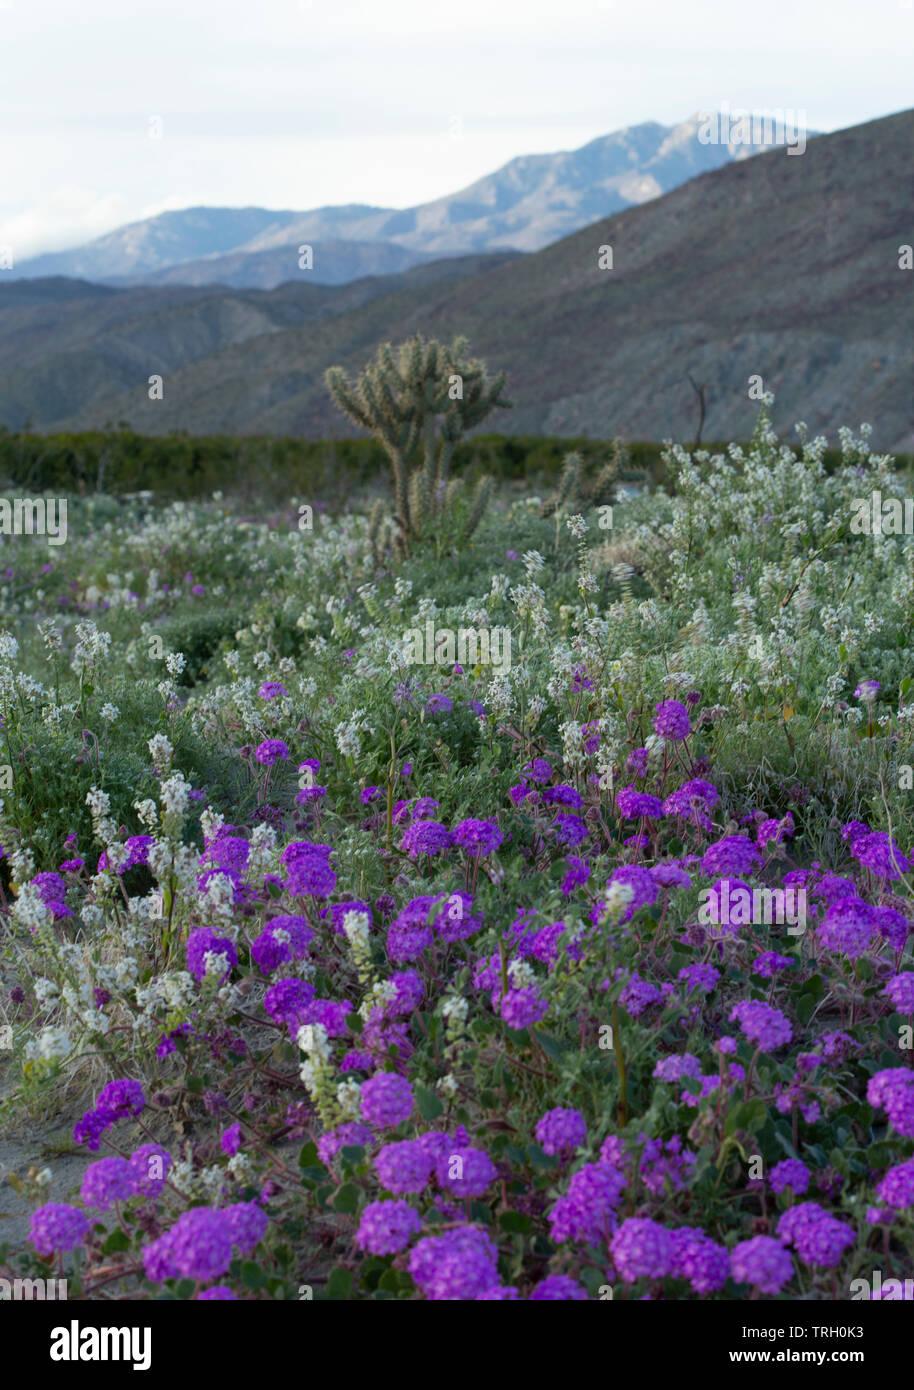 2019 Superbloom in the Anza Borrego Desert - Stock Image